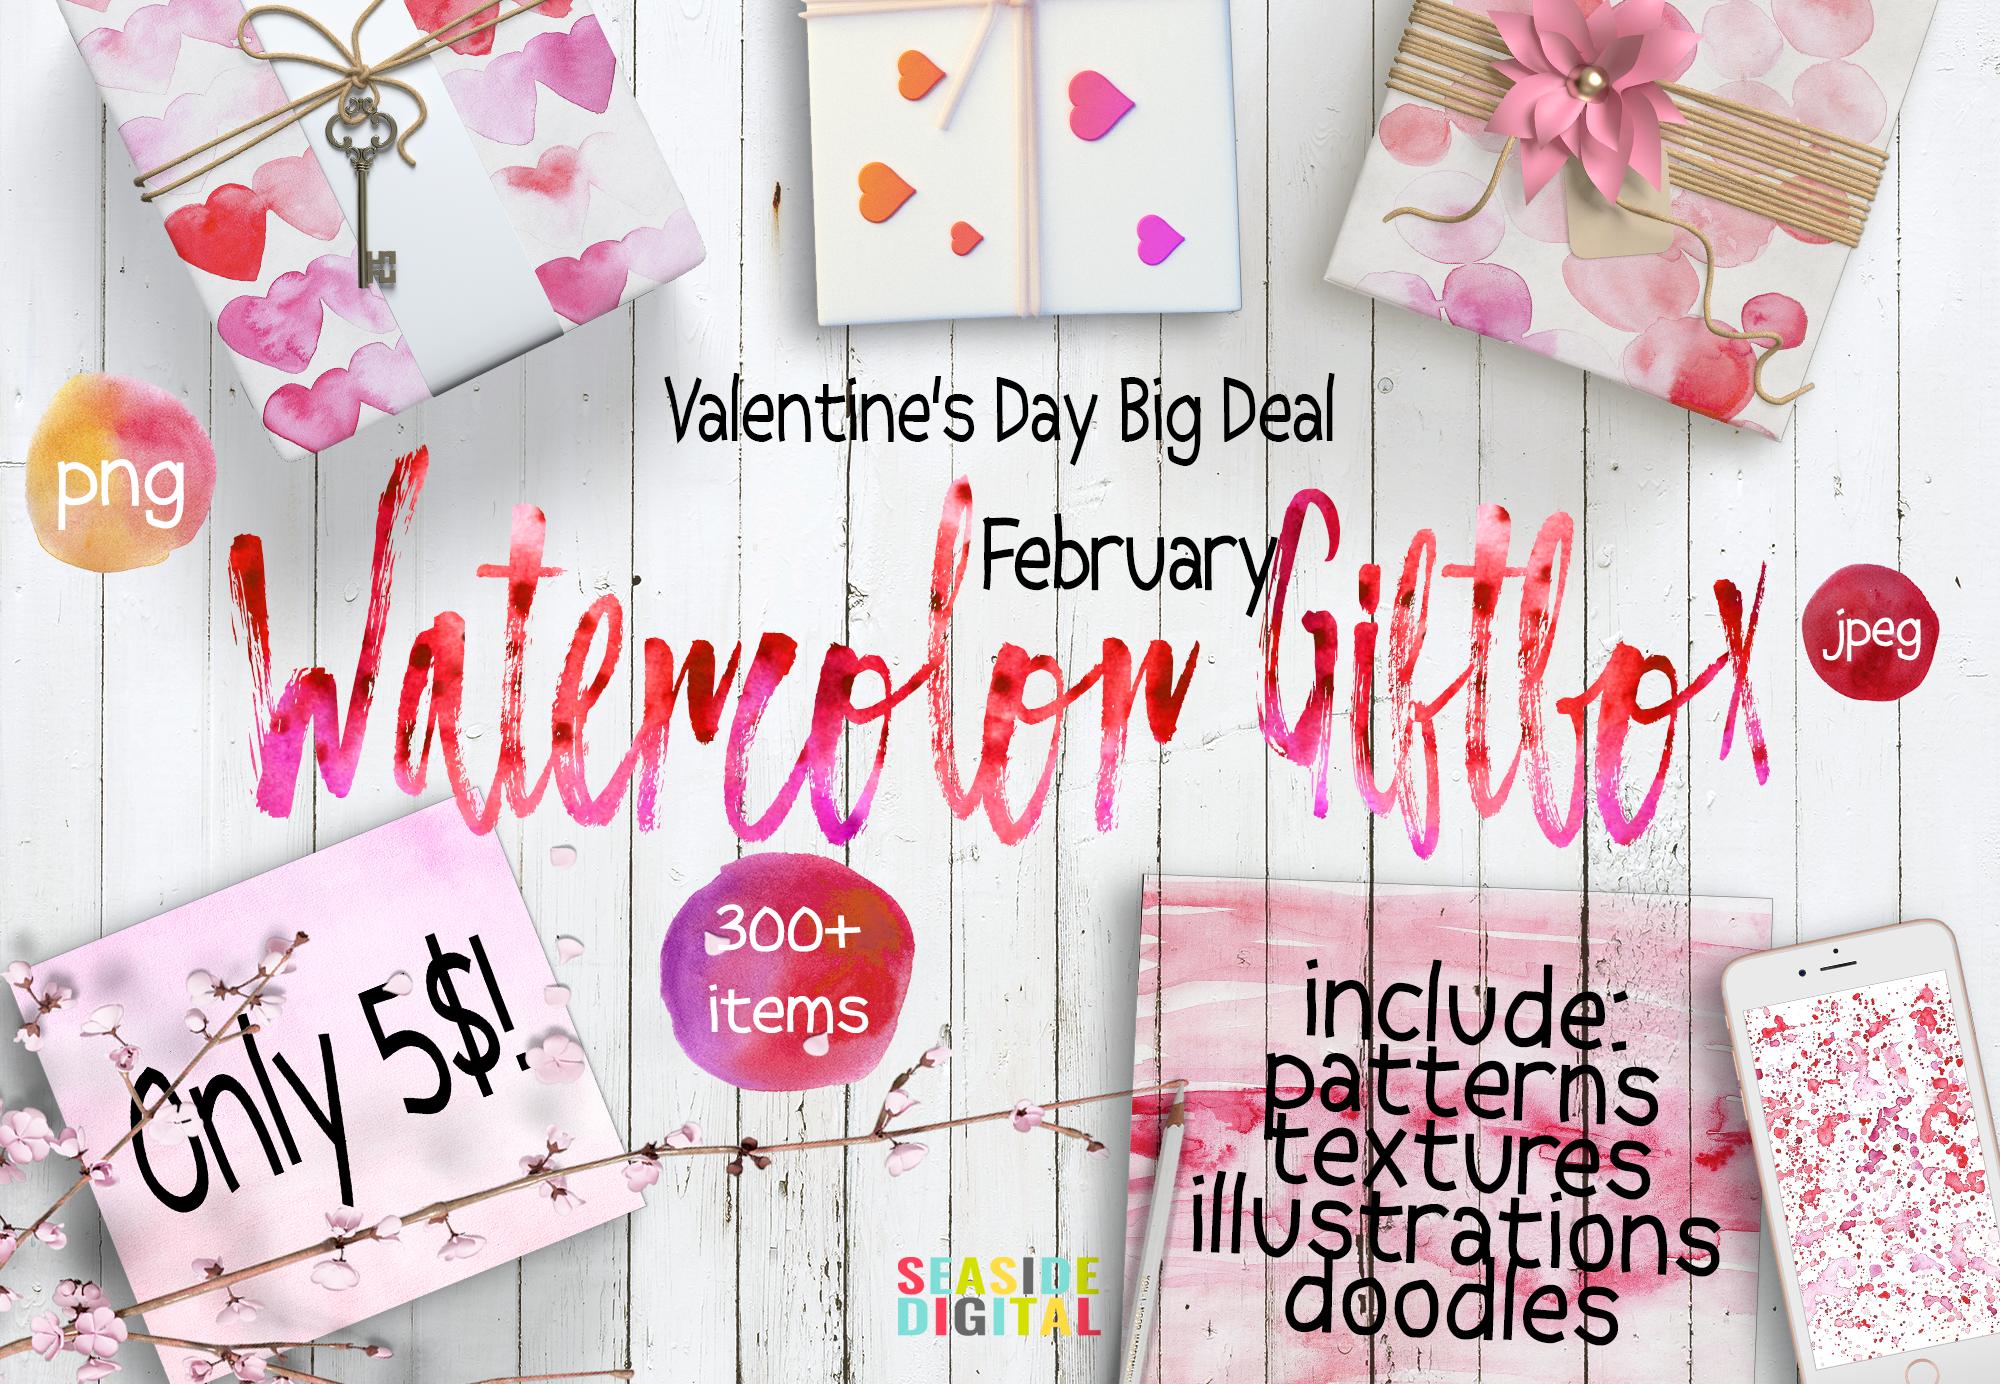 Valentine's Day Watercolor Giftbox example image 1